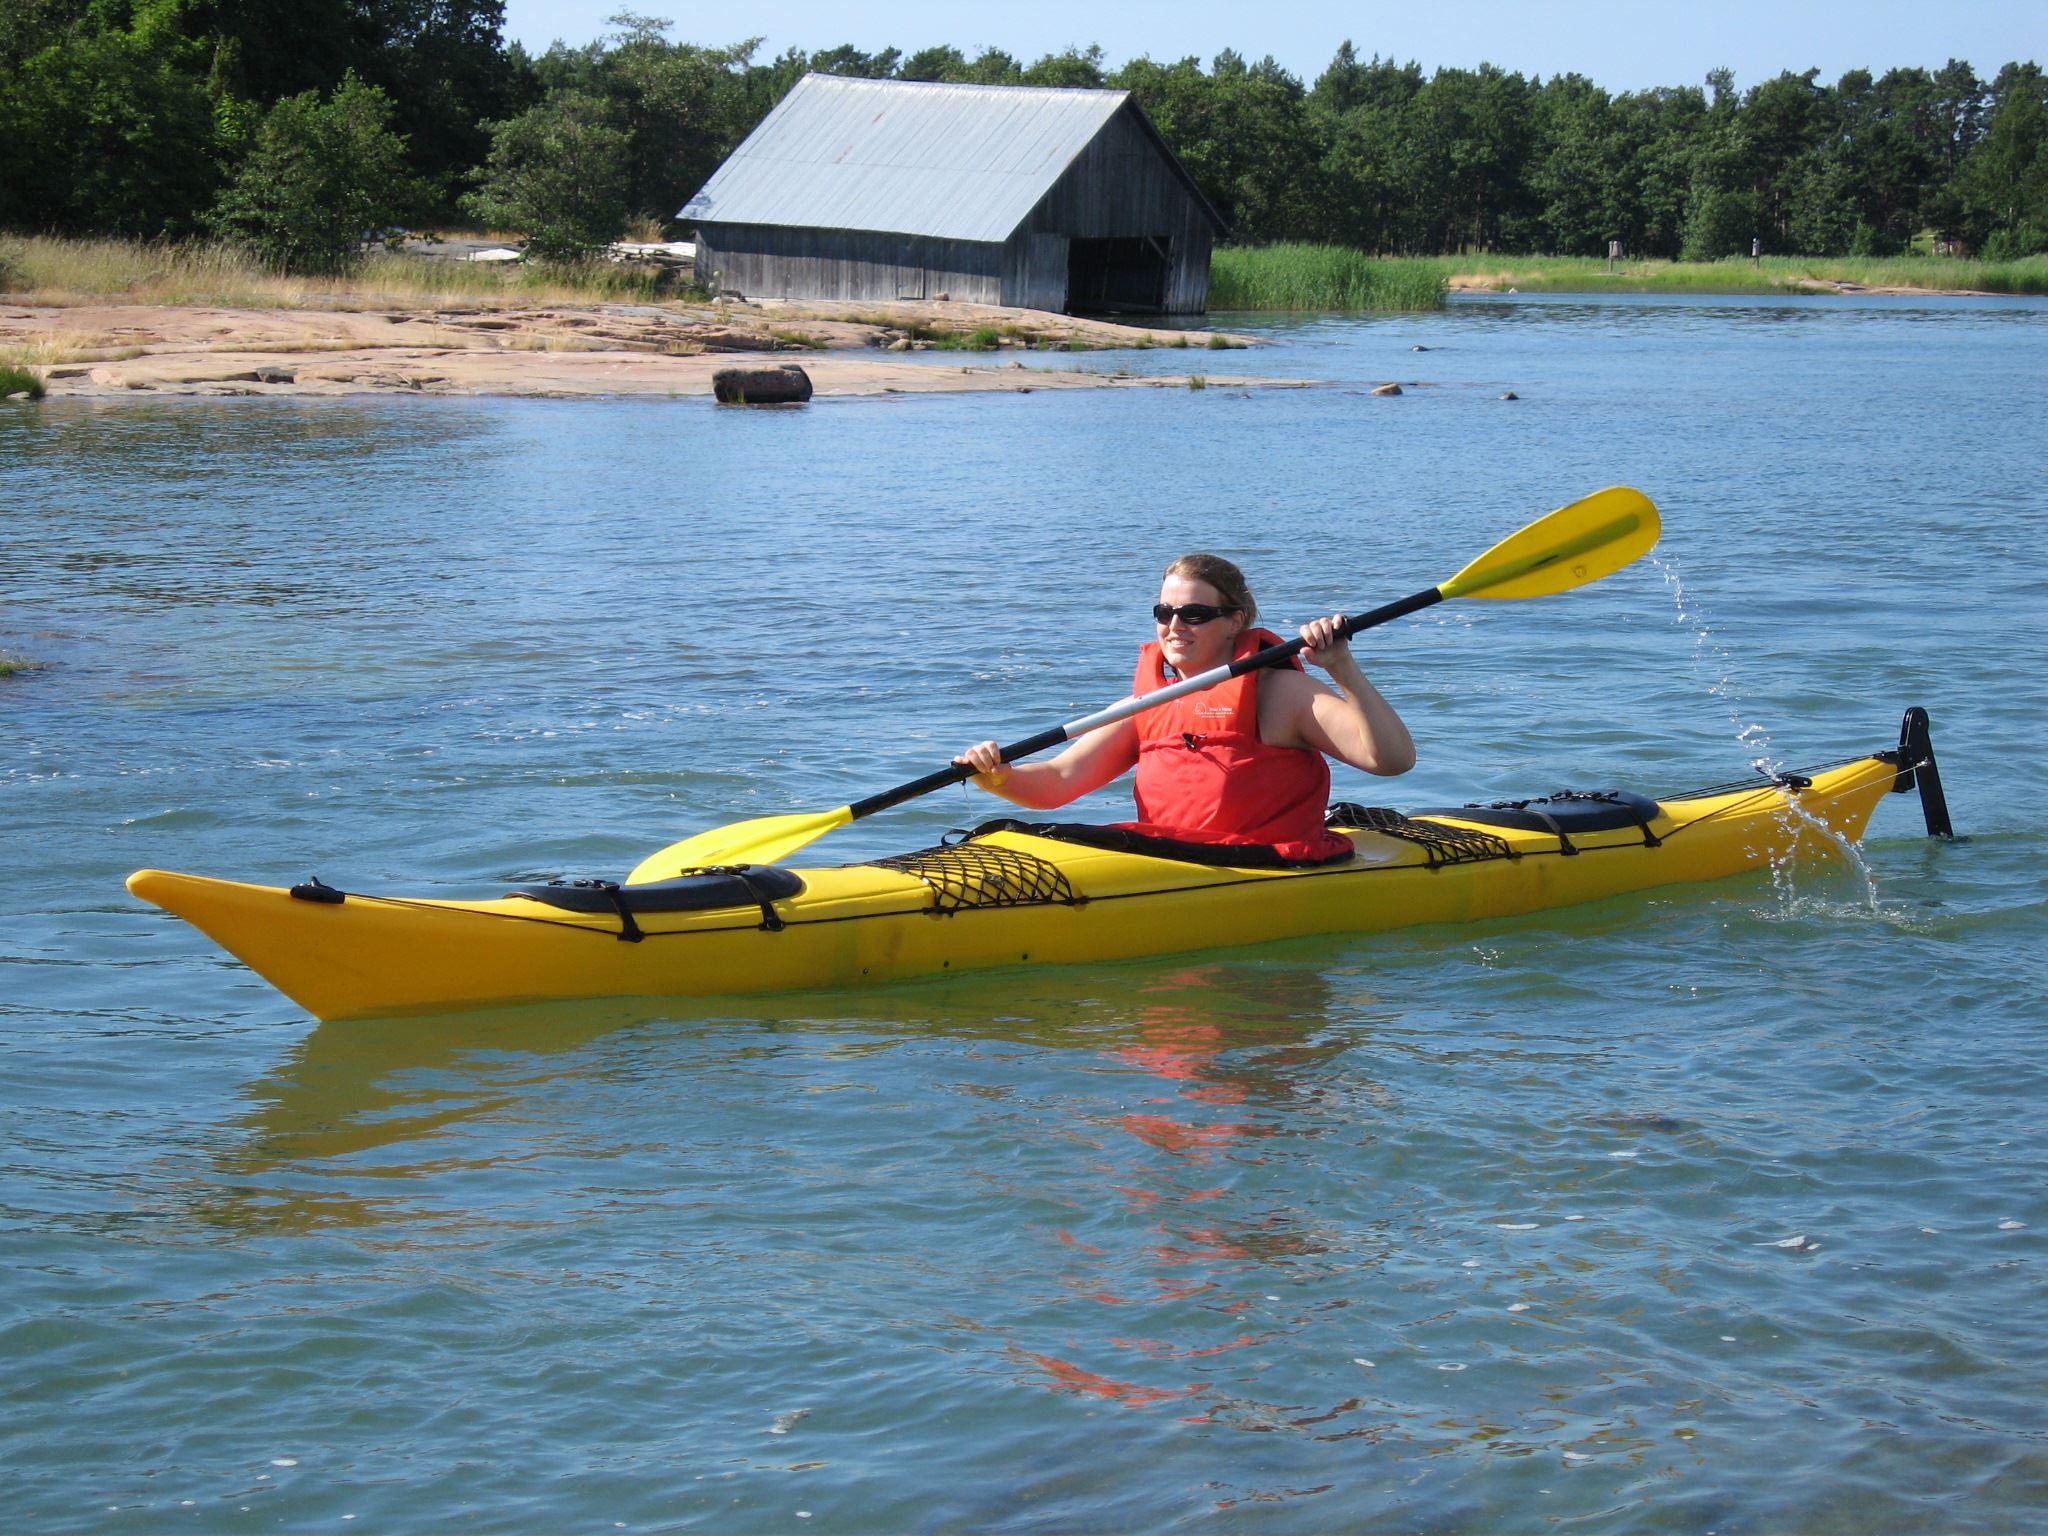 Nimix kayak rentals single kayaks, 2-3 hours